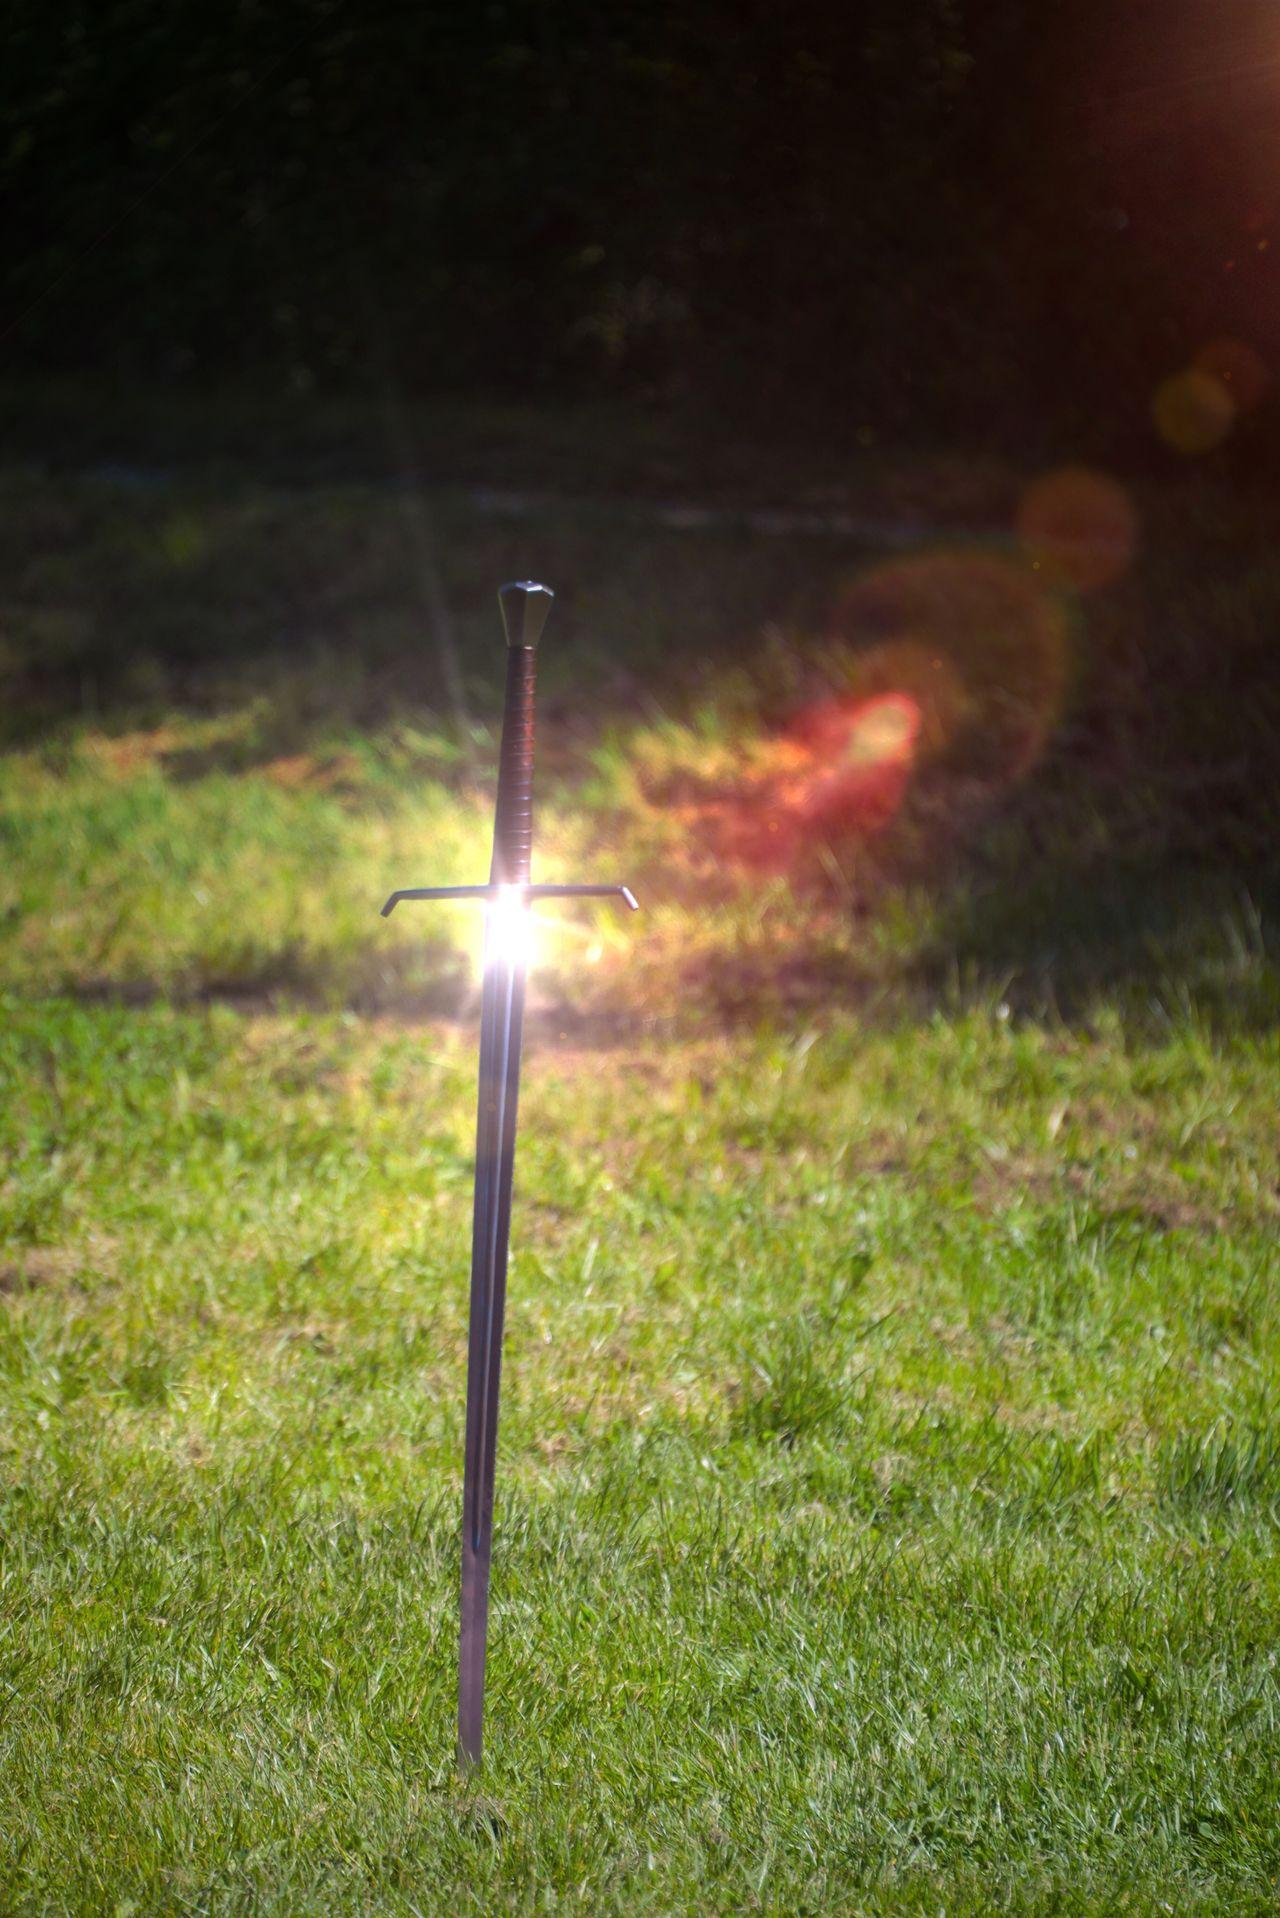 Grass Field No People Illuminated Outdoors Night Nature Close-up Épée Combat Fight Excalibur Medieval Surealism